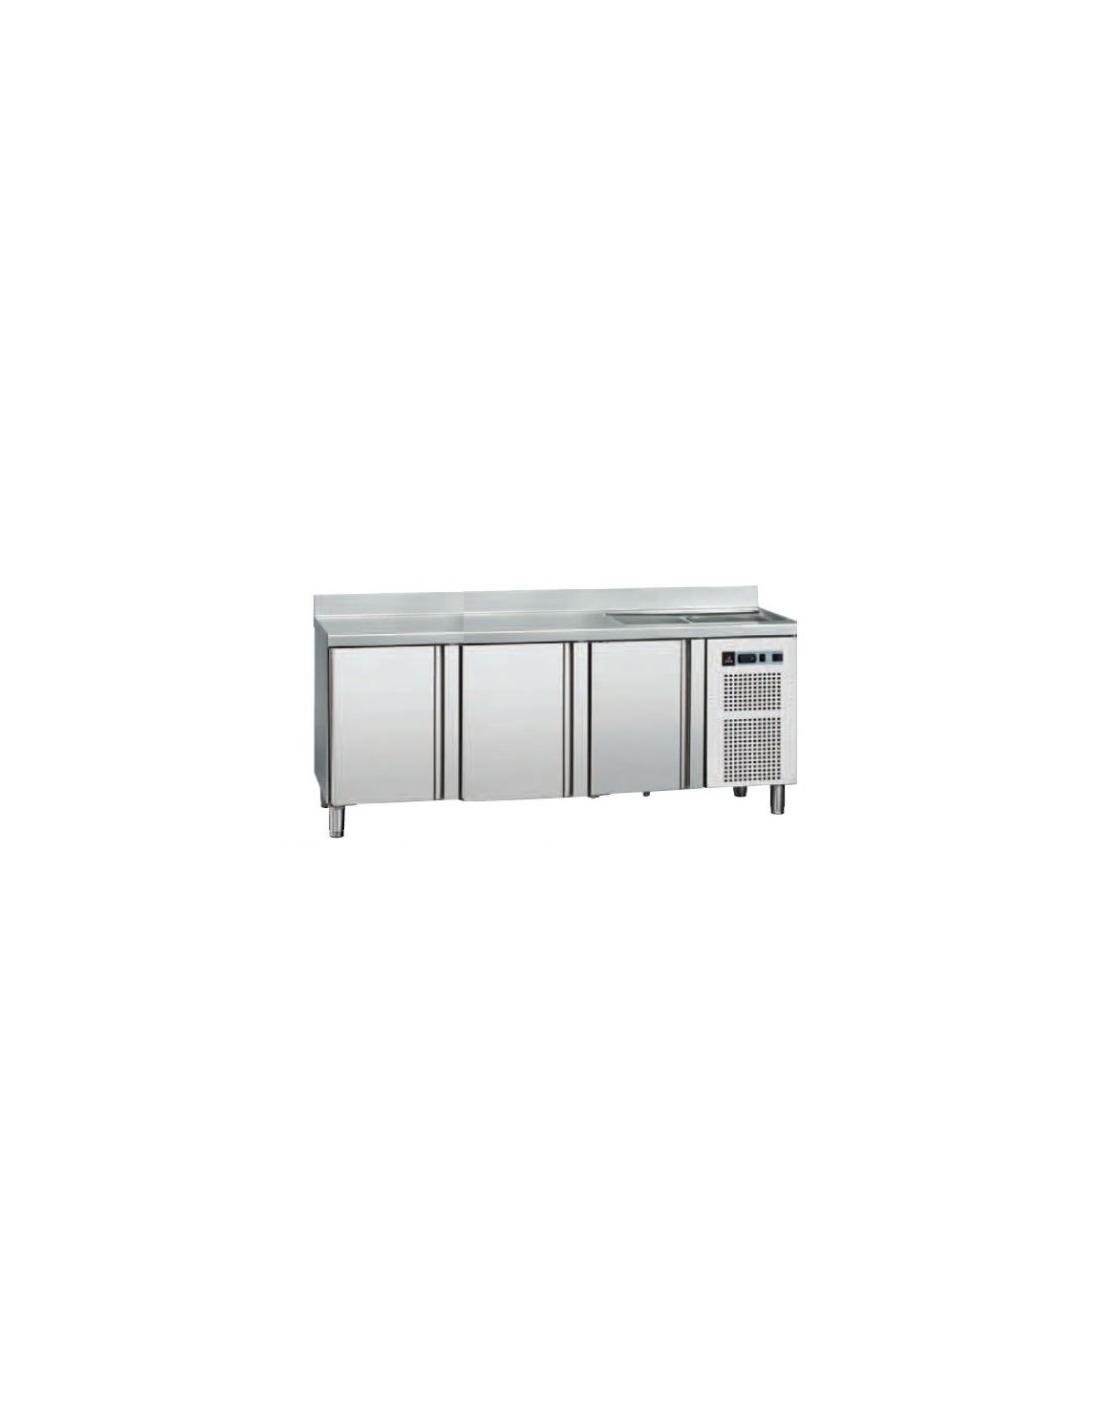 Mesa refrigerada fagor cms200f for Mesas con puertas